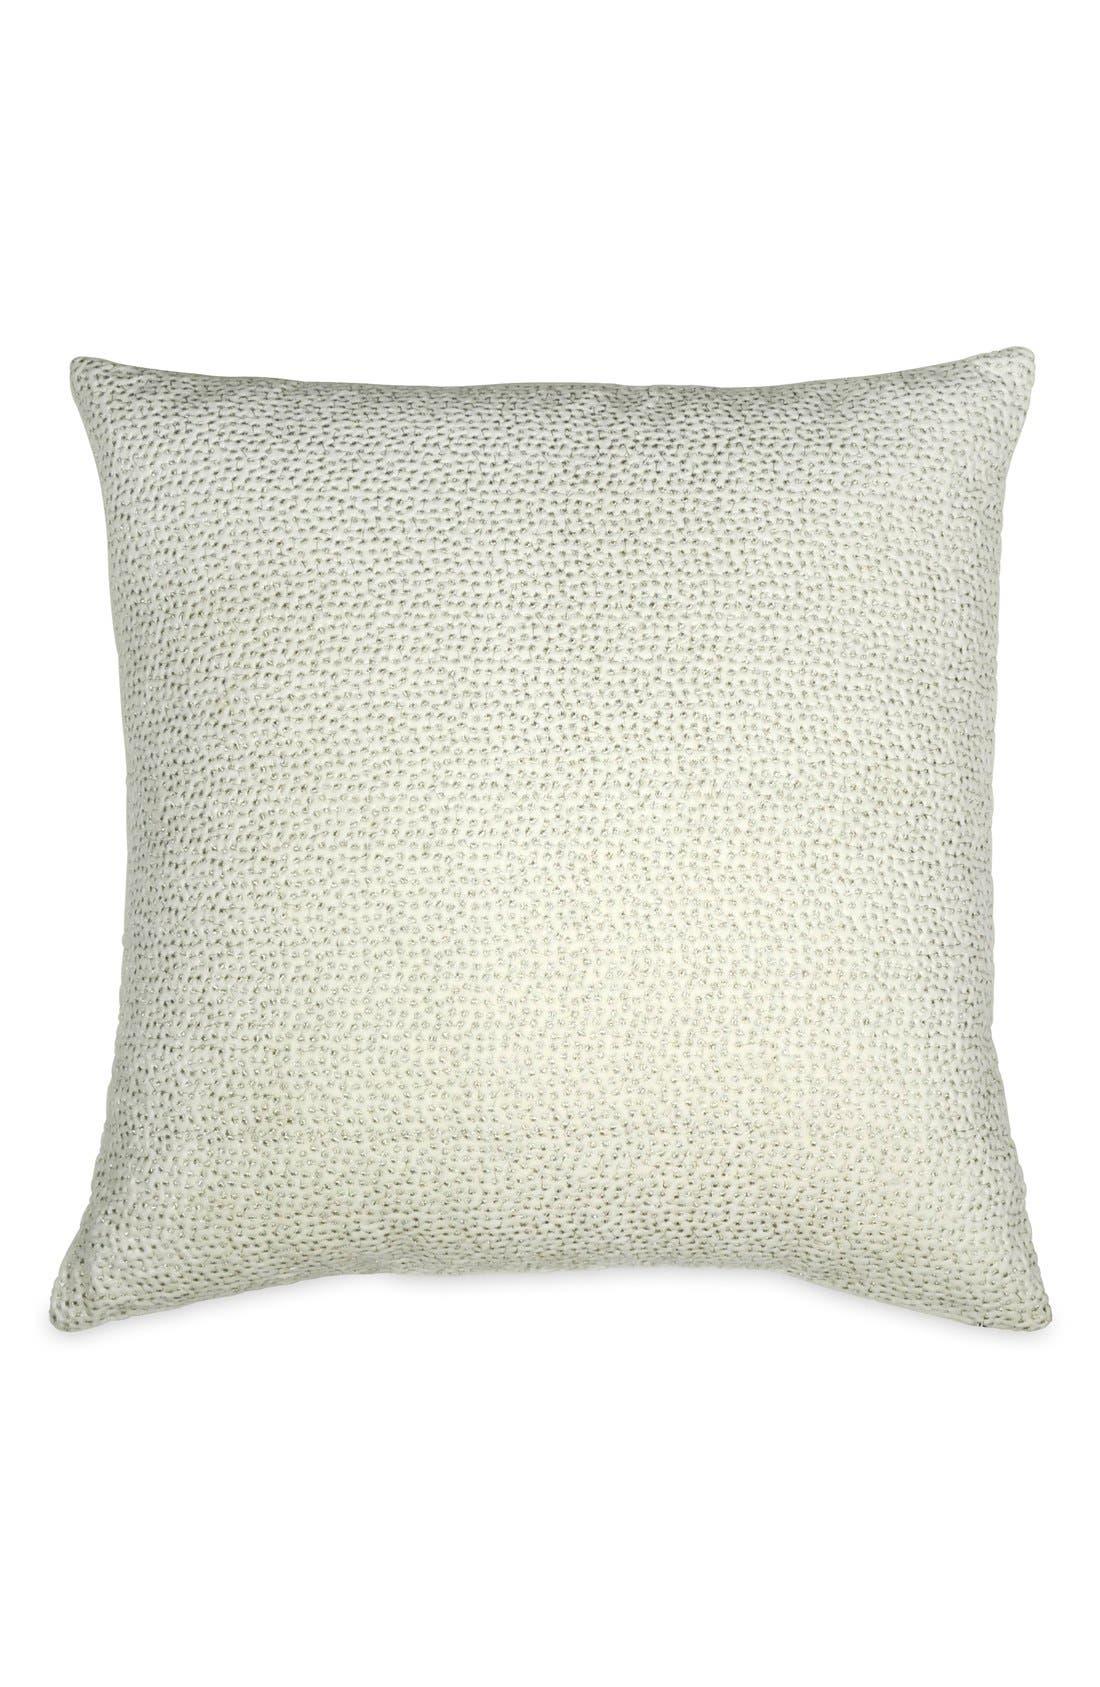 Donna Karan Collection 'Exhale' Pillow,                             Main thumbnail 1, color,                             Ivory